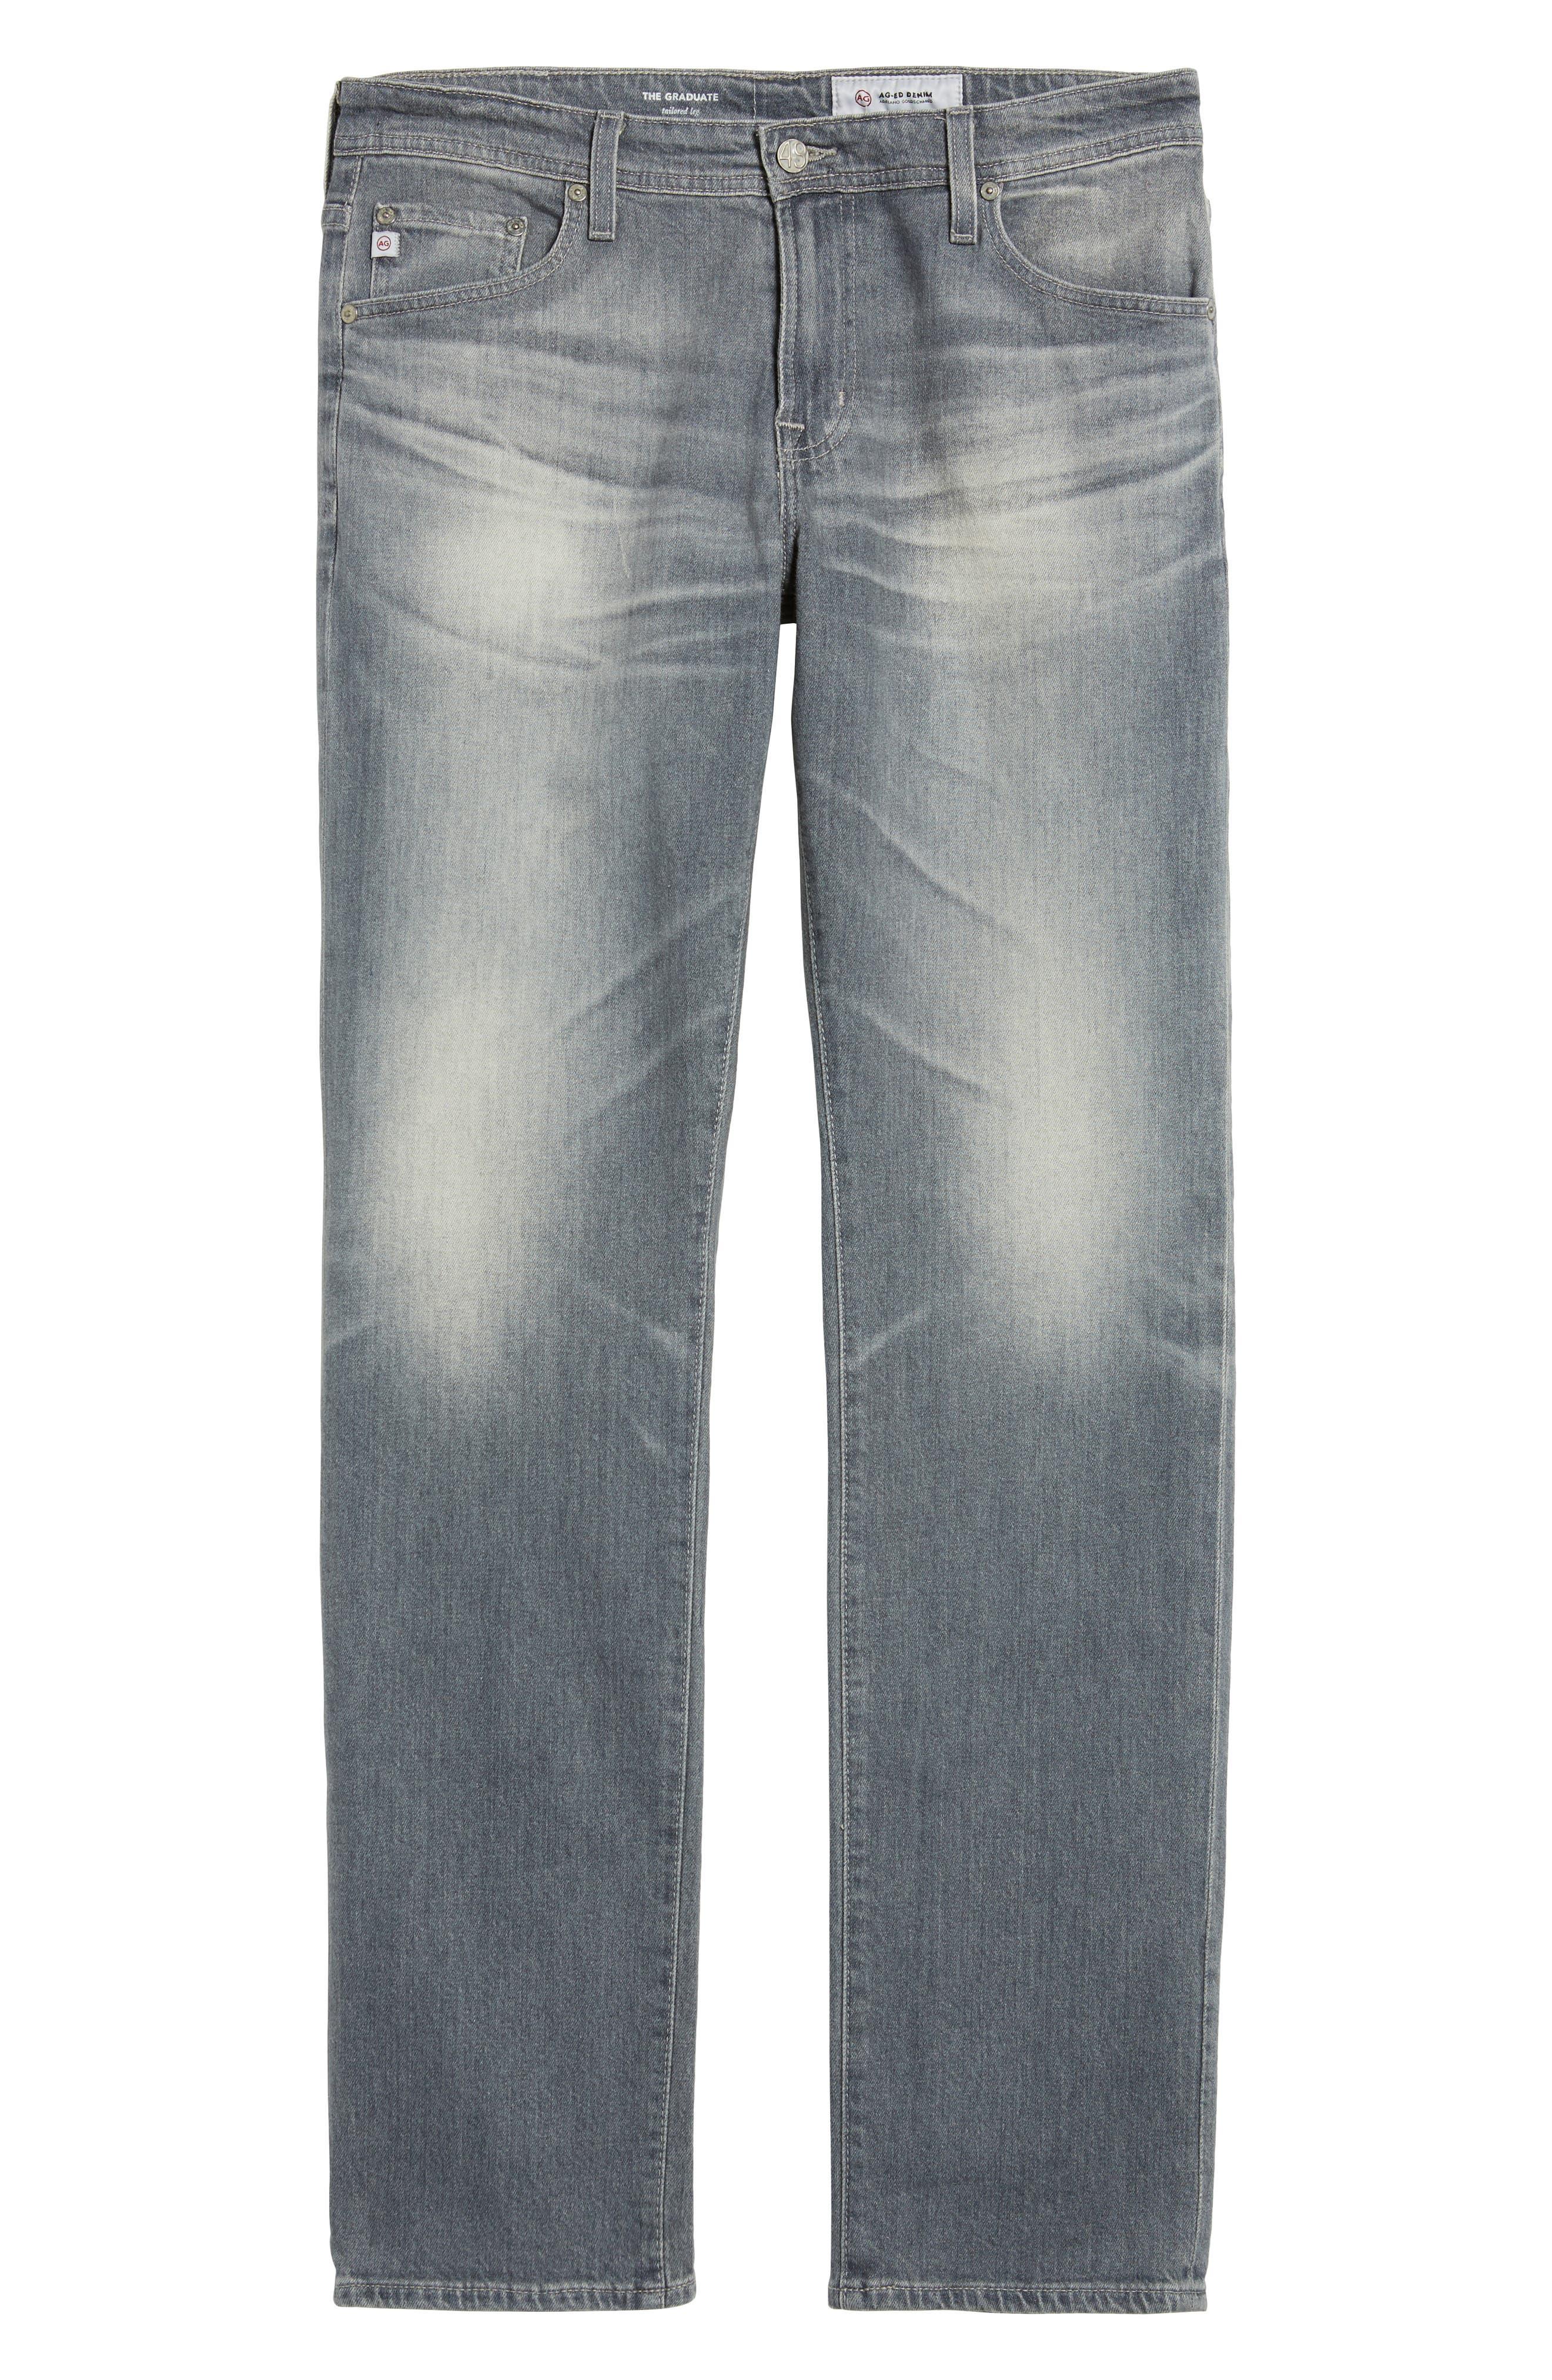 Graduate Slim Straight Fit Jeans,                             Alternate thumbnail 6, color,                             020